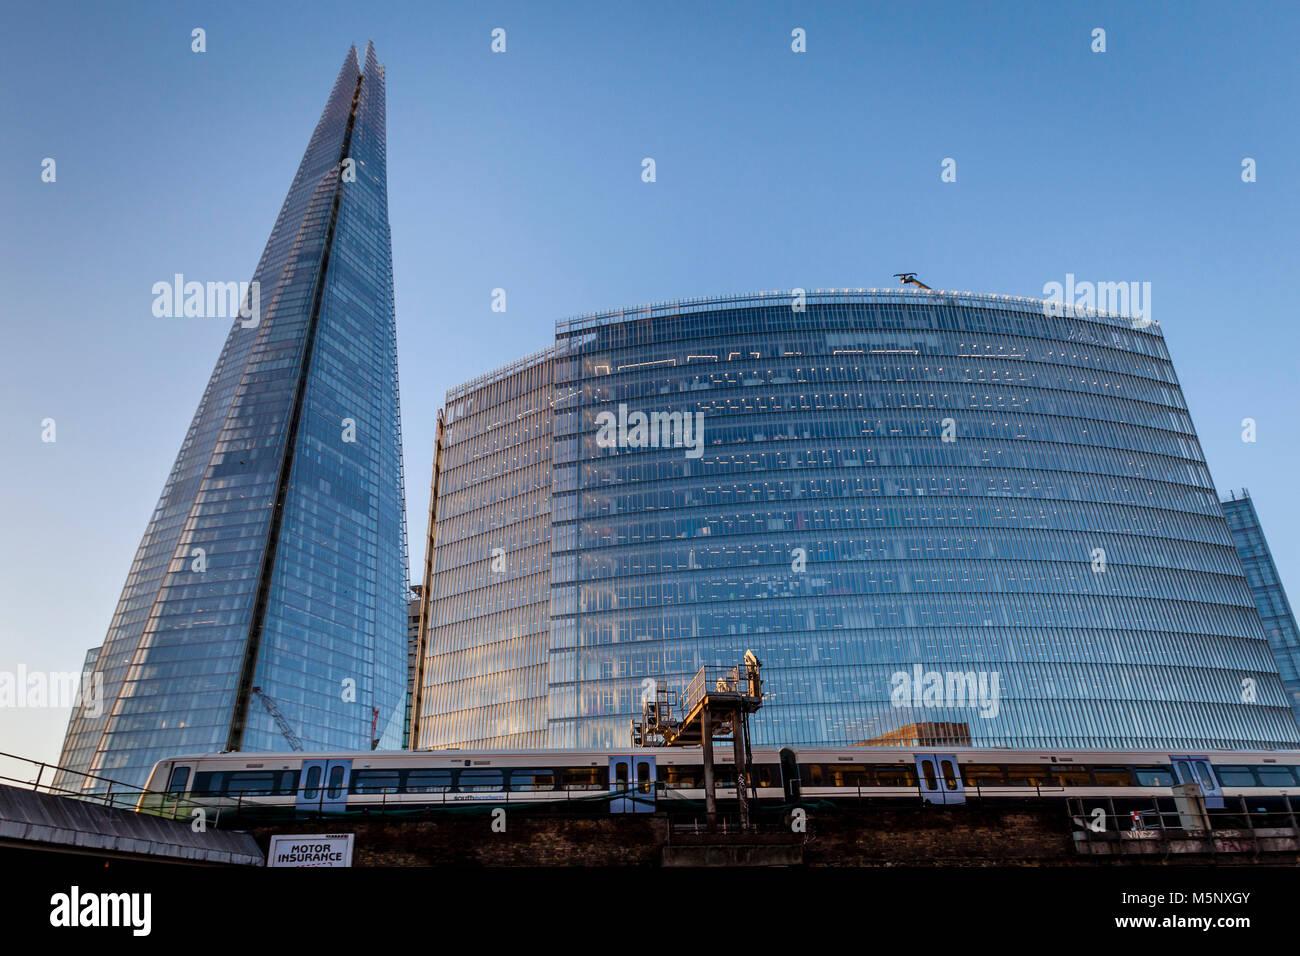 A Commuter Train Passes The Shard and The News Building, London Bridge Quarter, London, UK - Stock Image